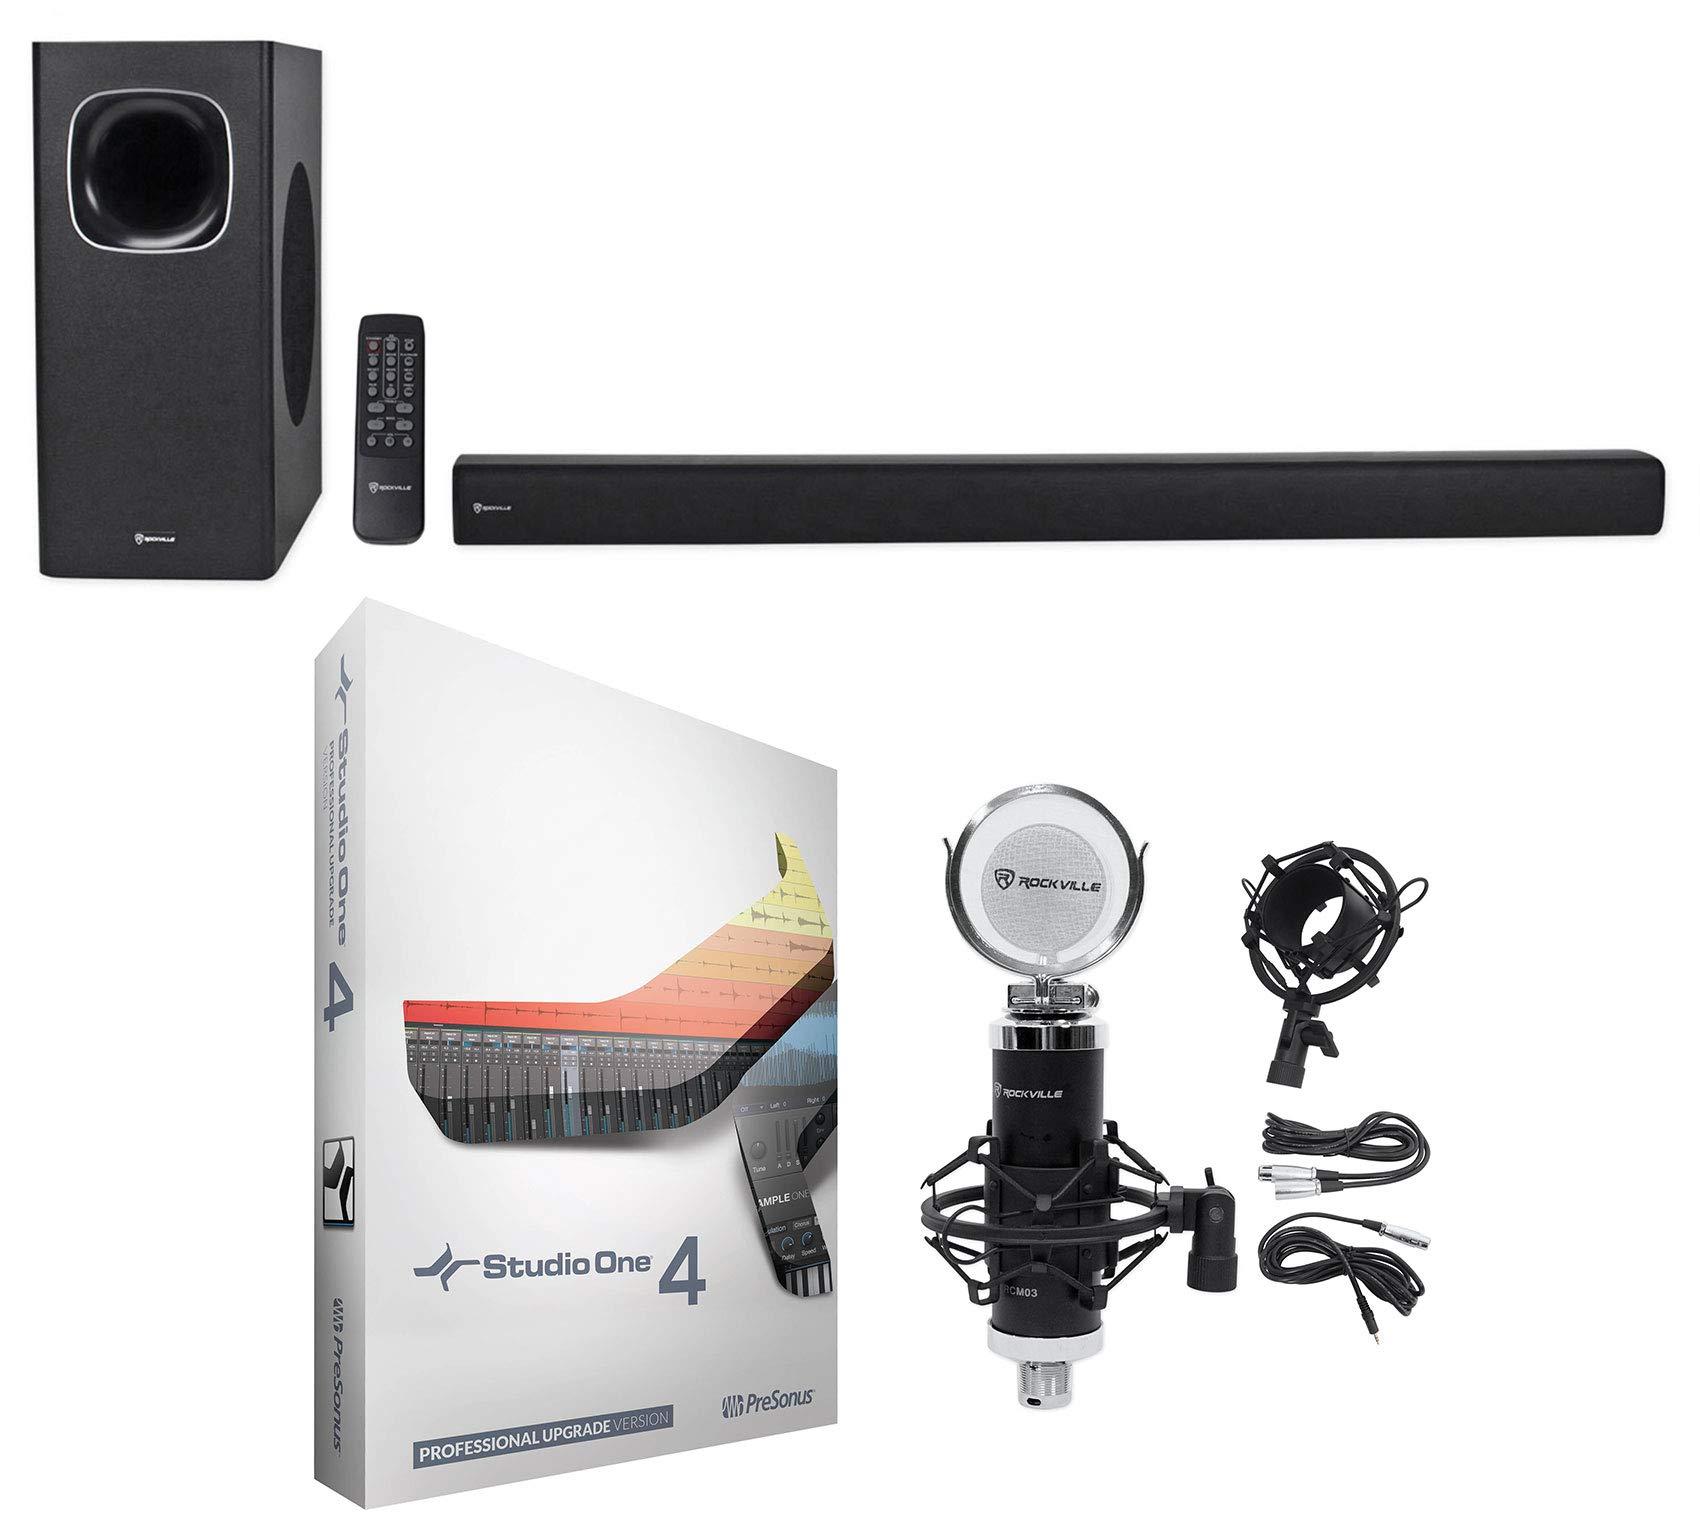 Presonus Studio One 4 Pro Upgrade from Artist/Producer+Soundbar+Microphone